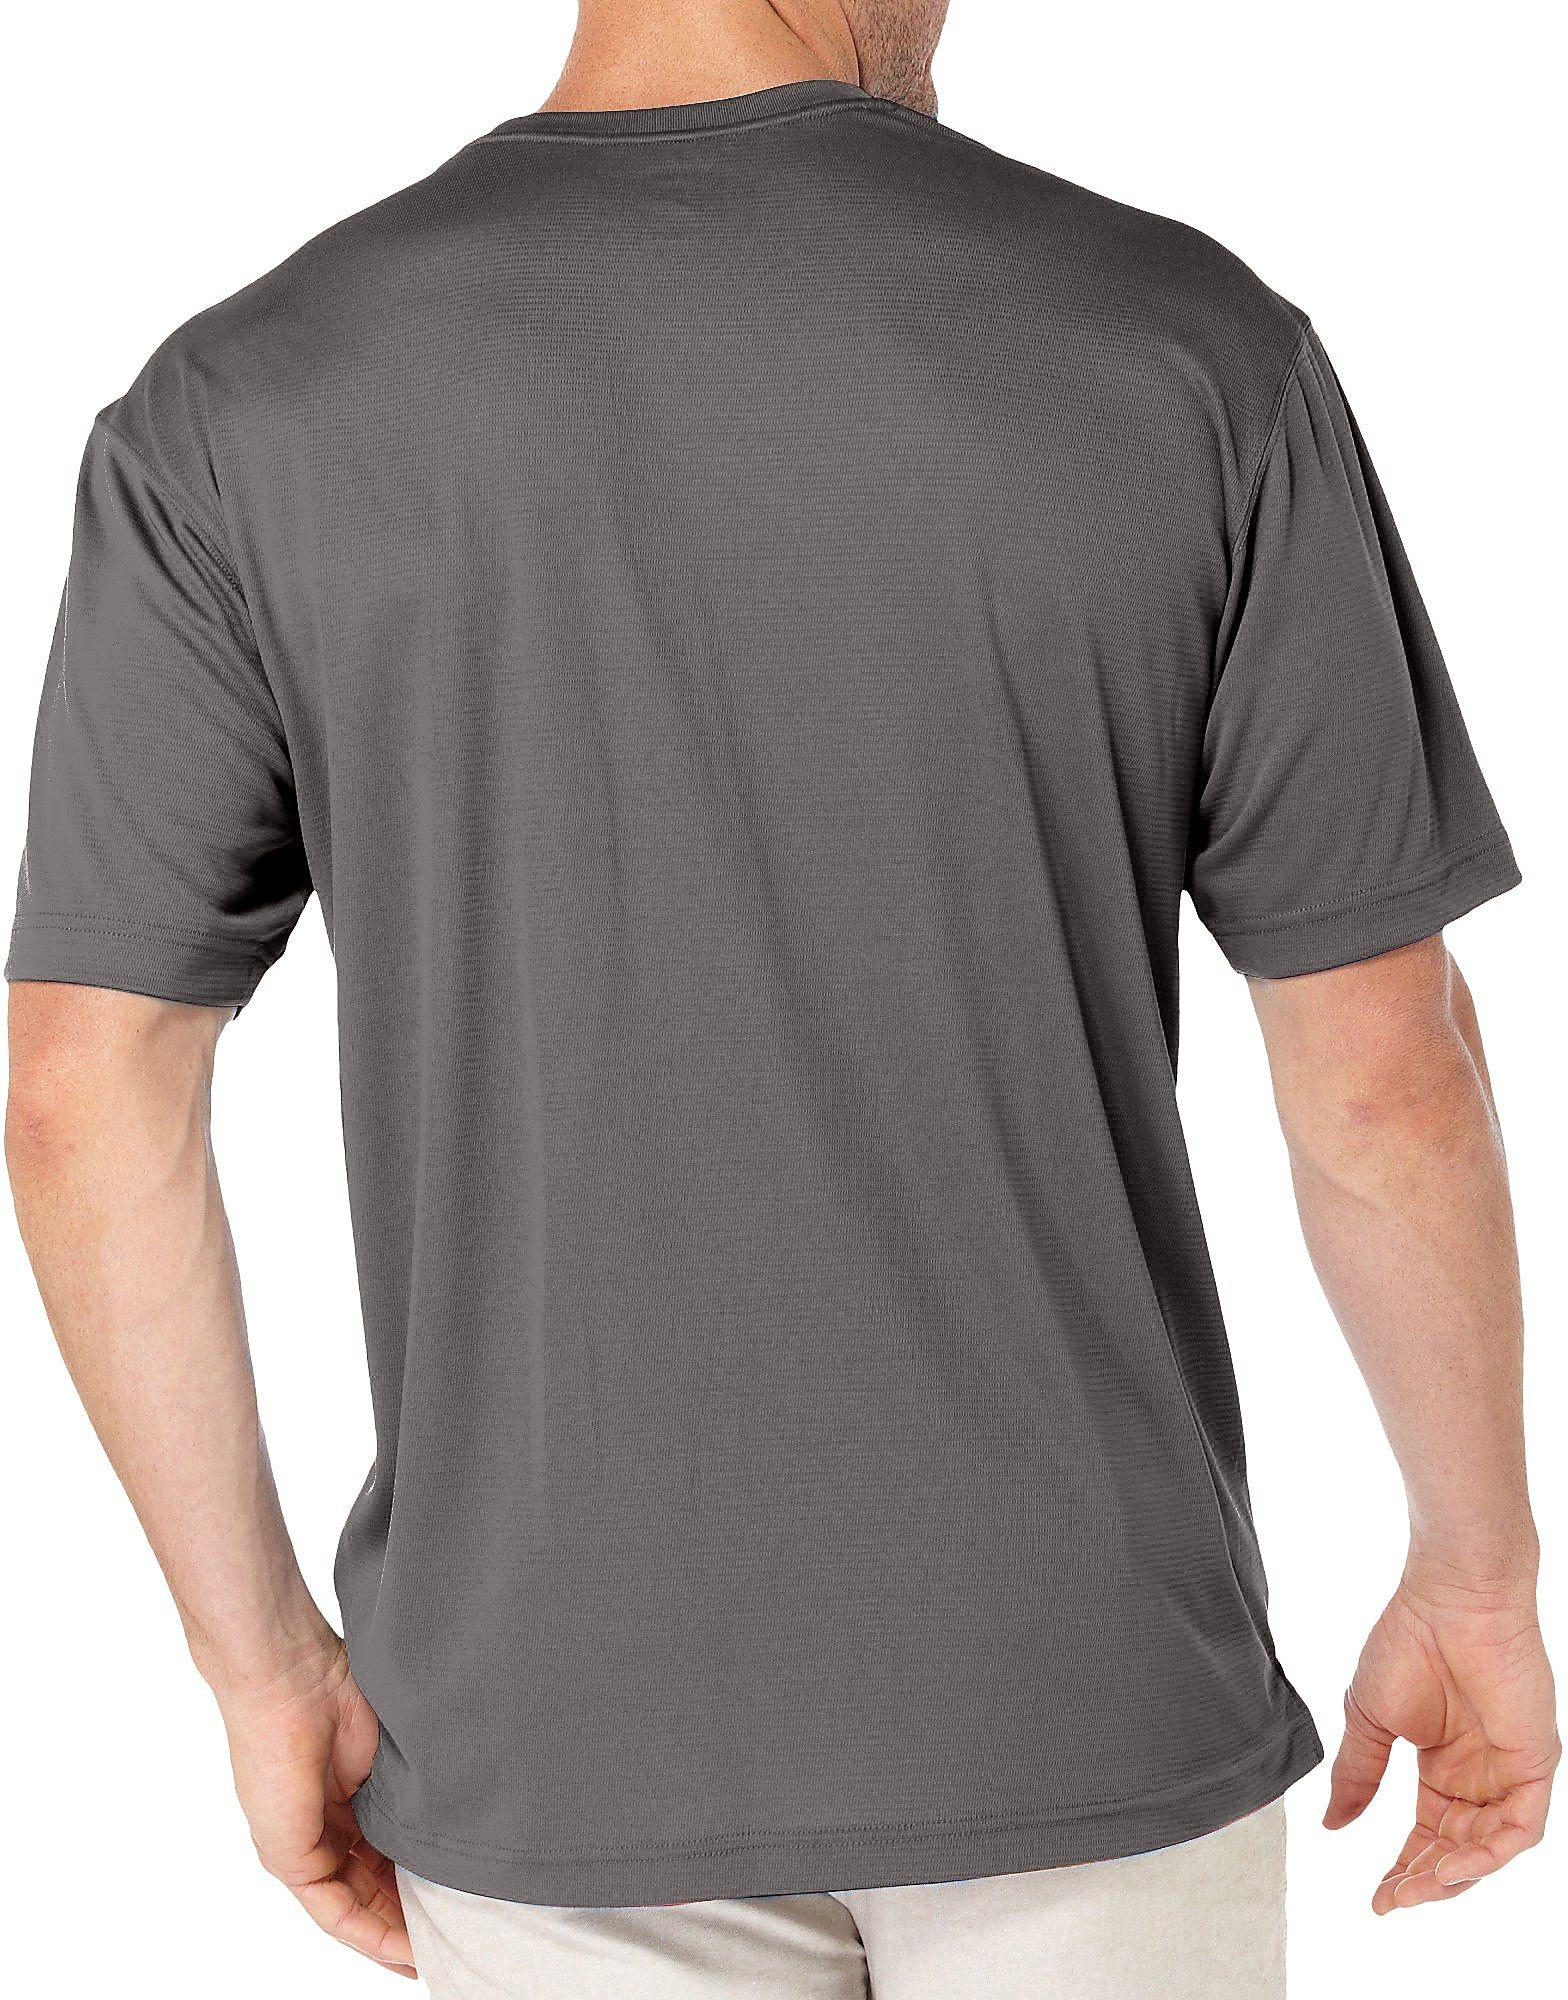 Reel Legends Mens Freeline Long Sleeve Shirt X-Large Bungee Cord Beige